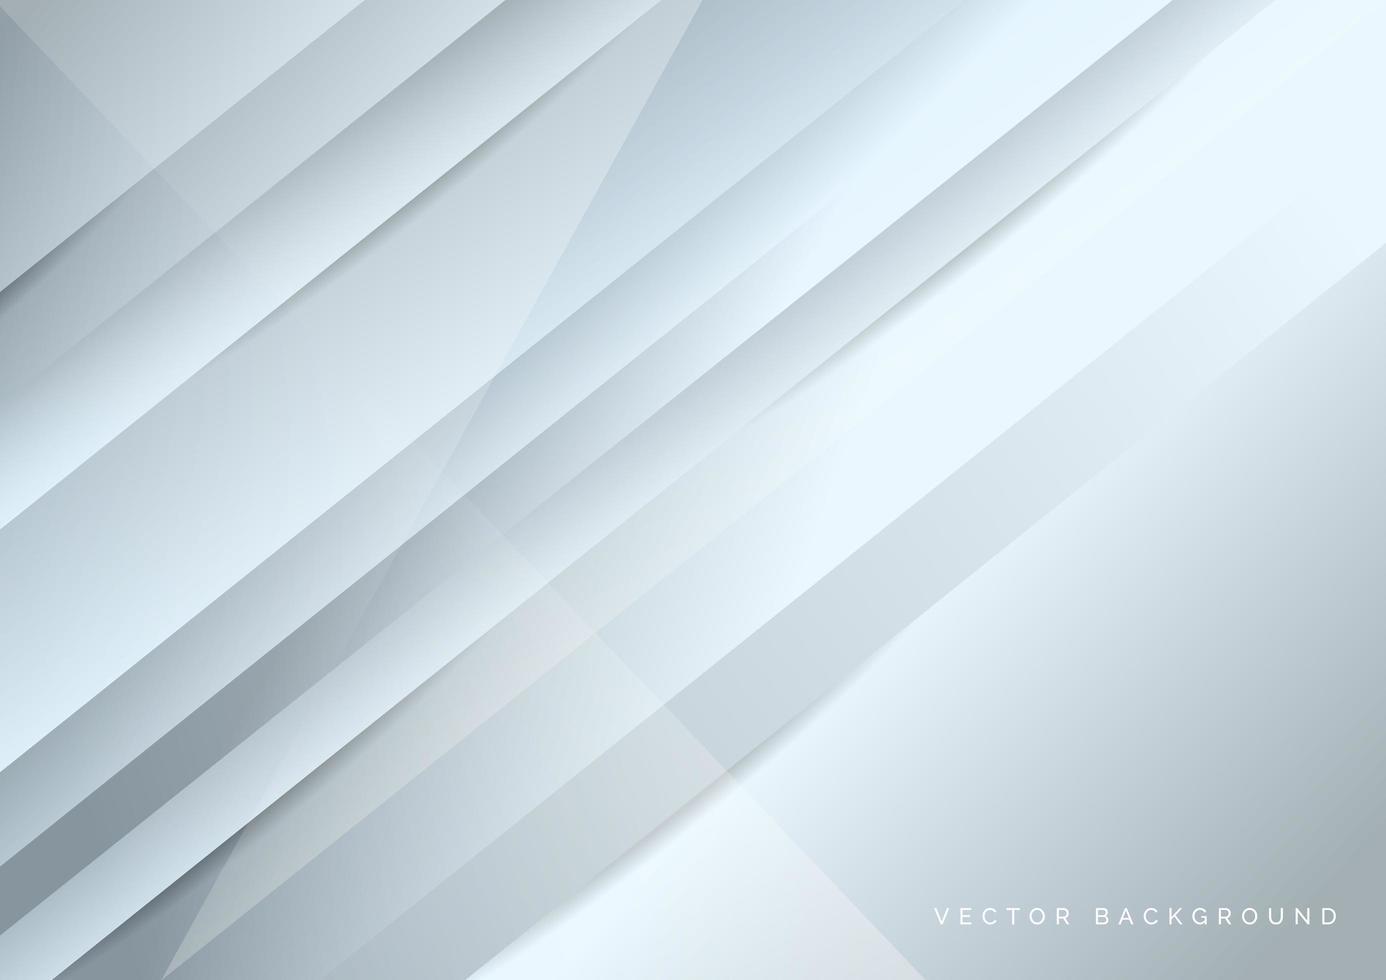 fundo prateado abstrato moderno vetor